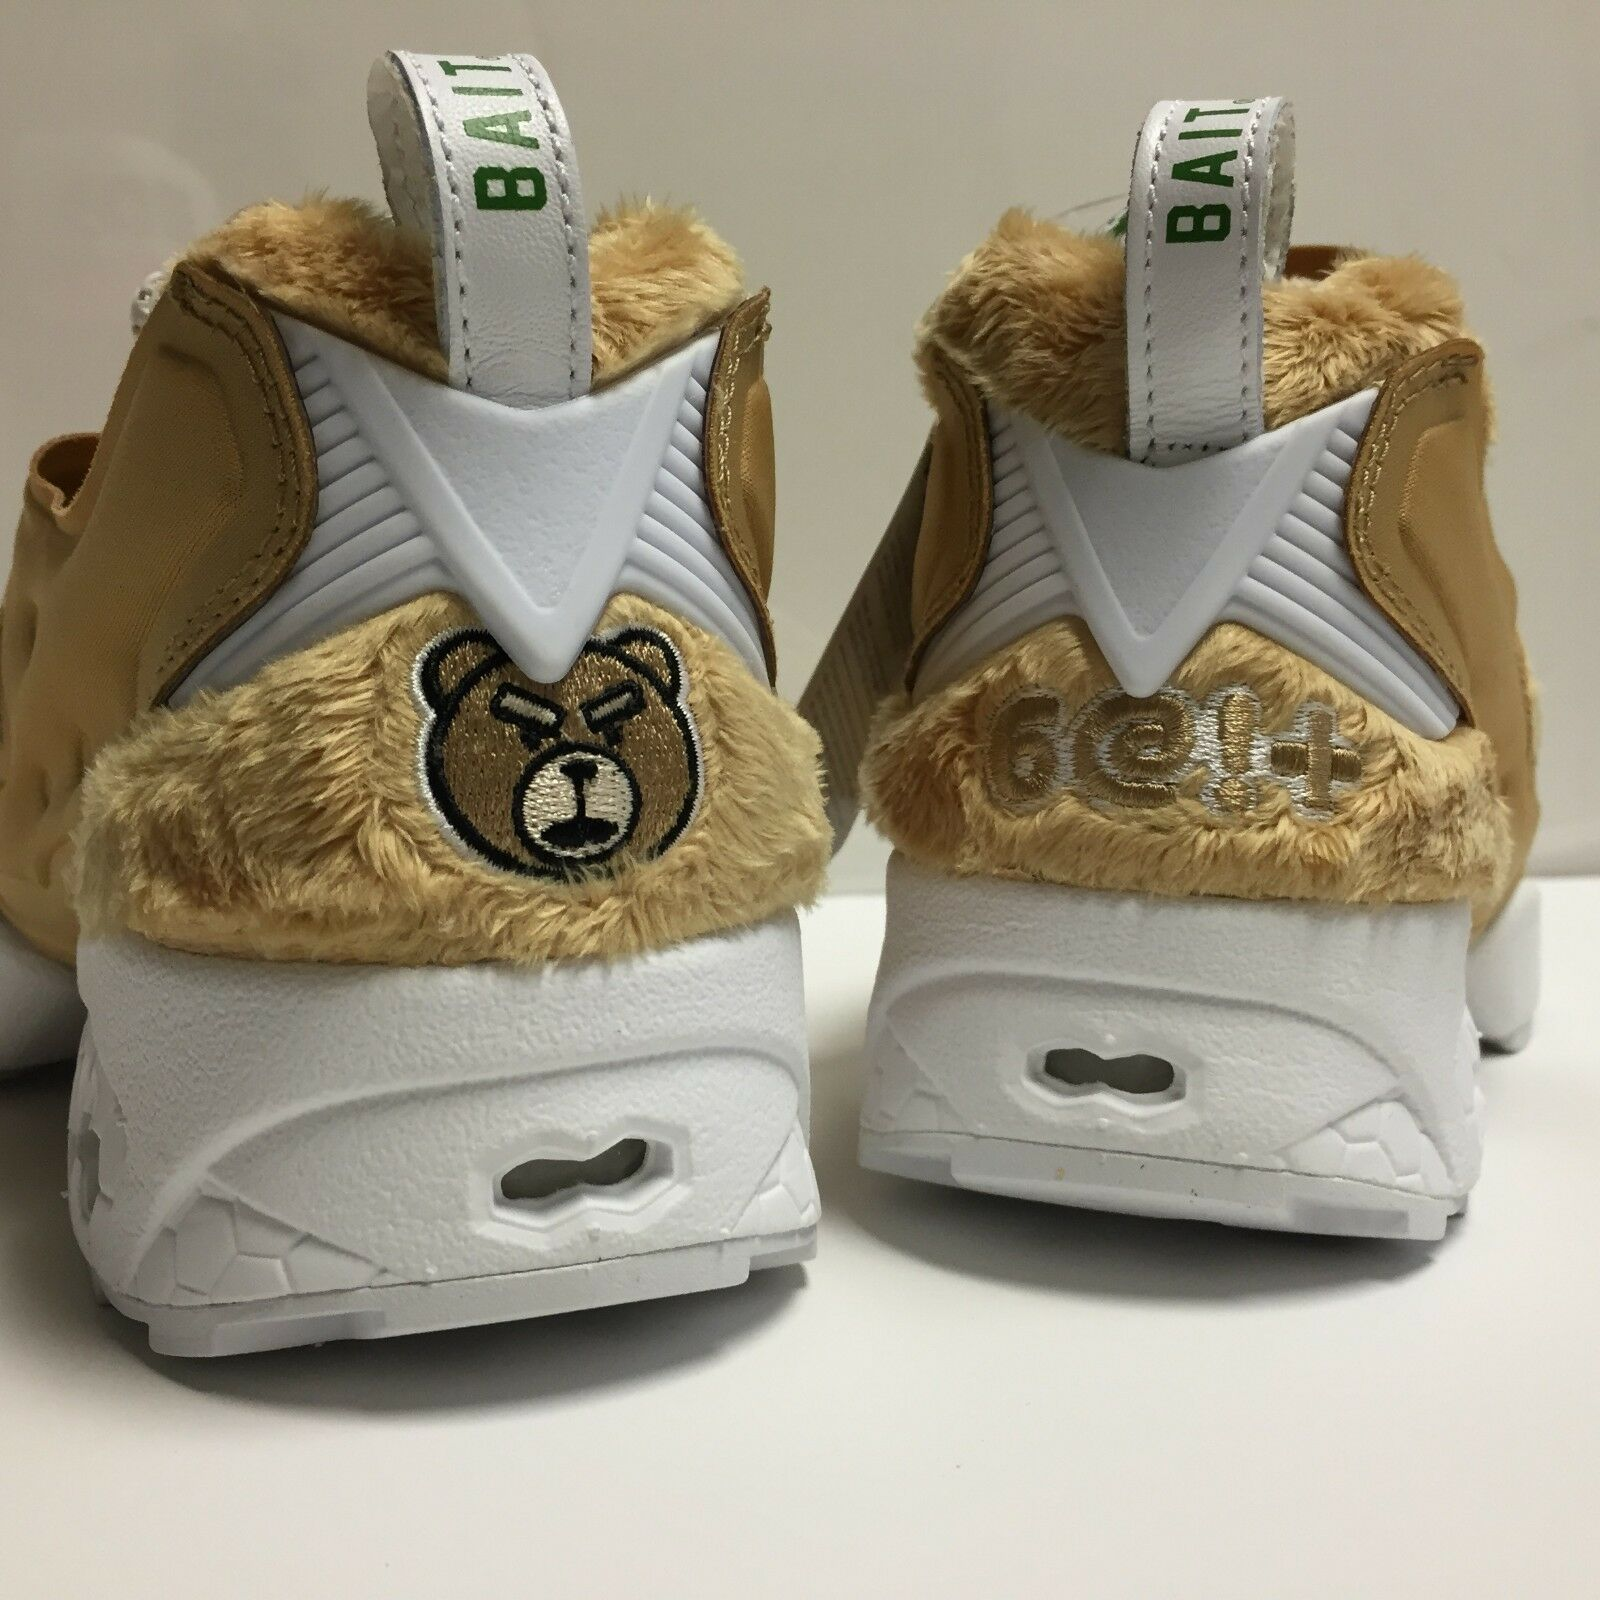 New authentic MEN Reebok instapump Fury ANGRY TED 2 BAIT Fashion scarpe da ginnastica AQ9351